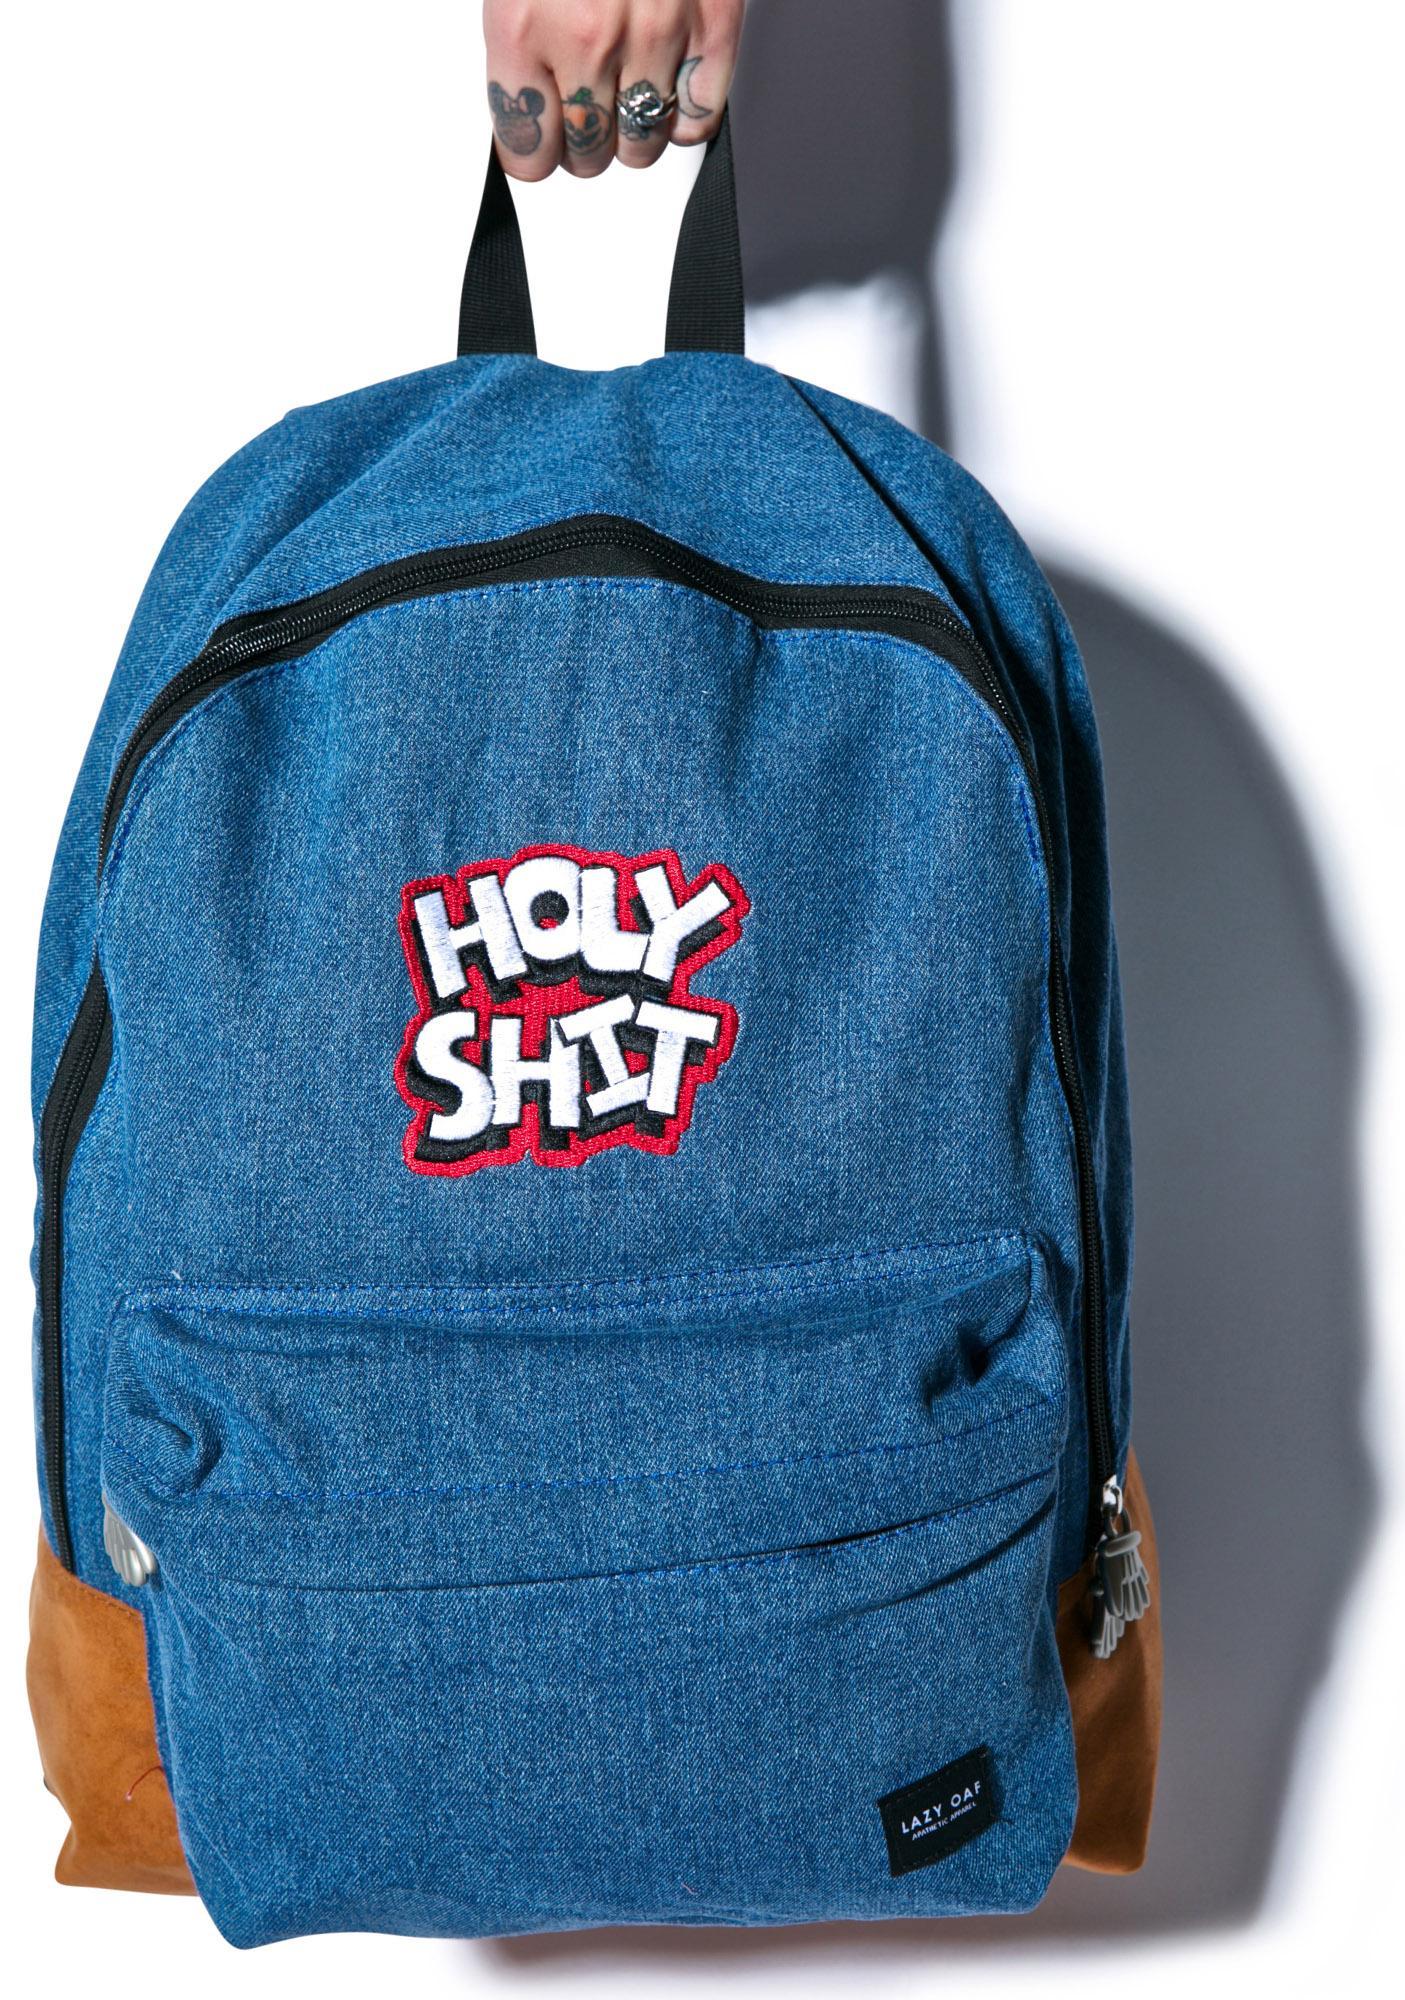 Lazy Oaf Holy Shit Backpack